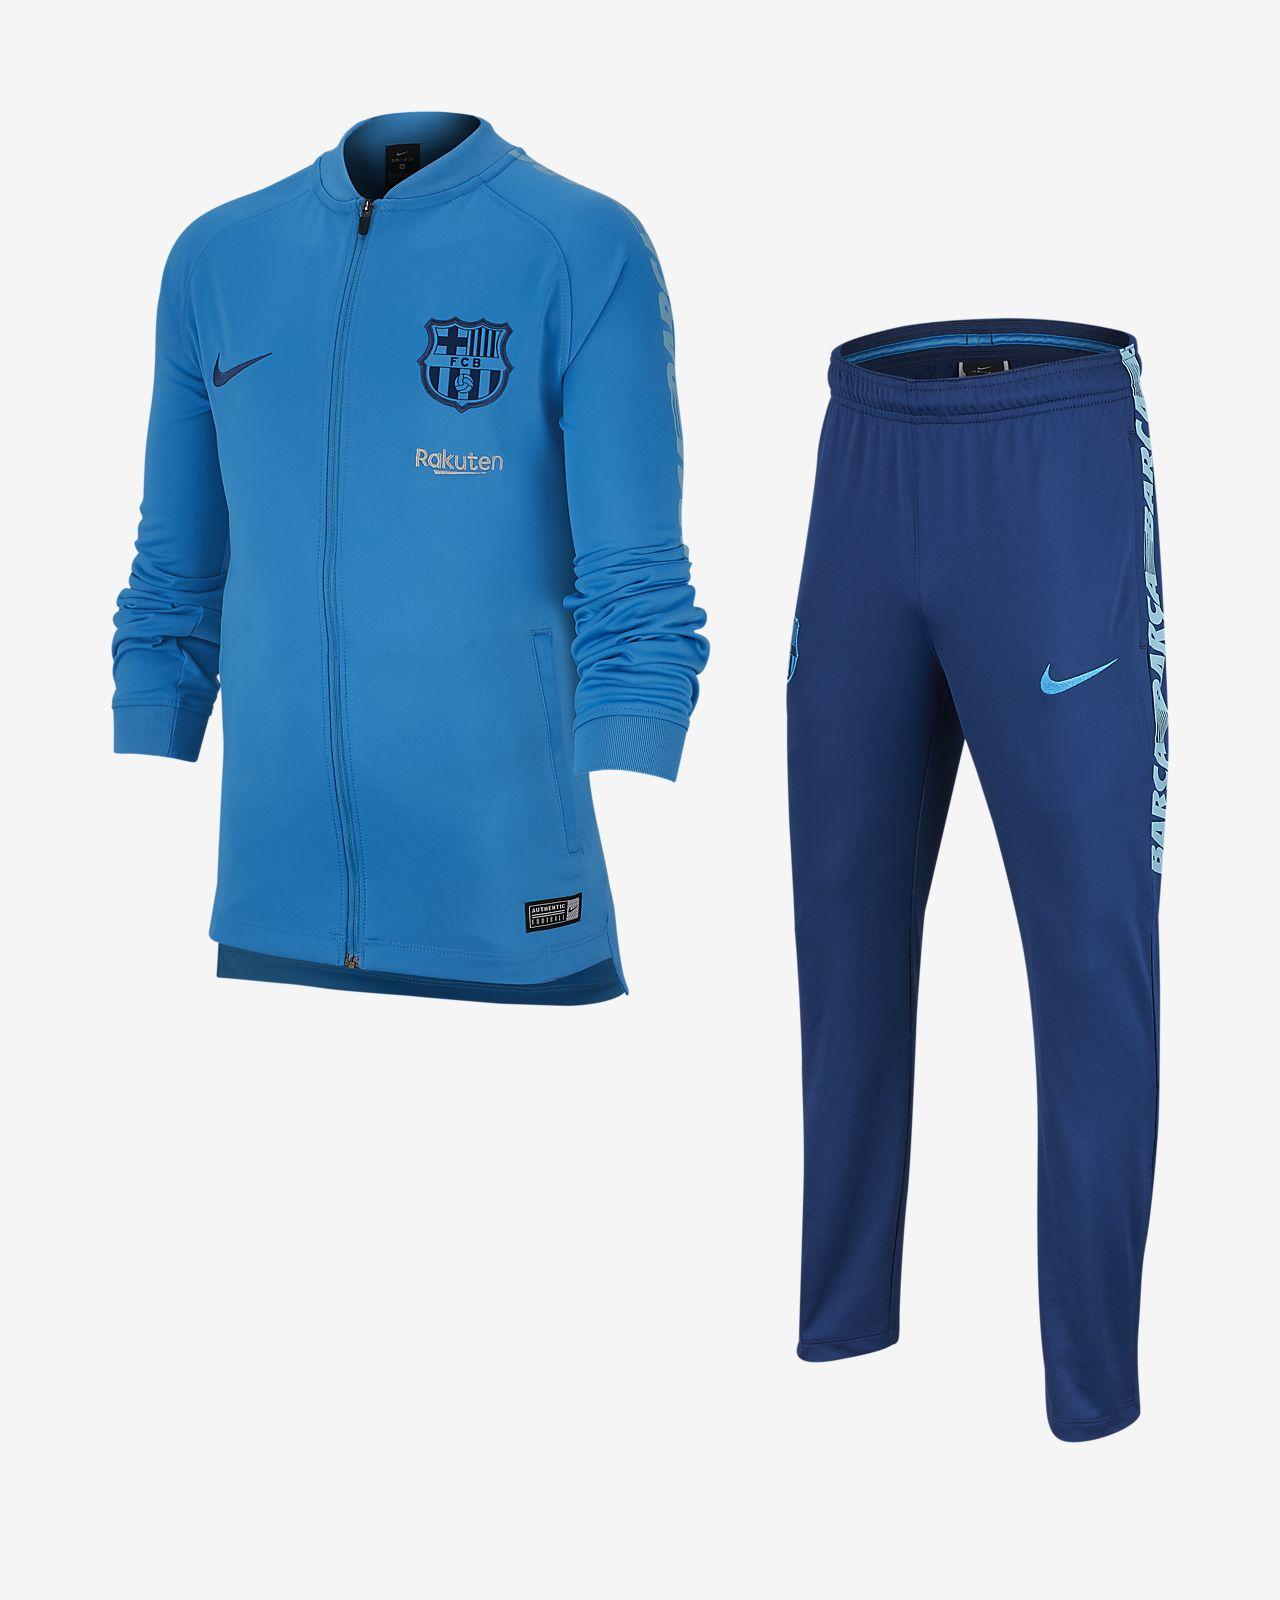 c7538d800add2 FC Barcelona Dri-FIT Squad Chándal de fútbol - Niño a. Nike.com ES